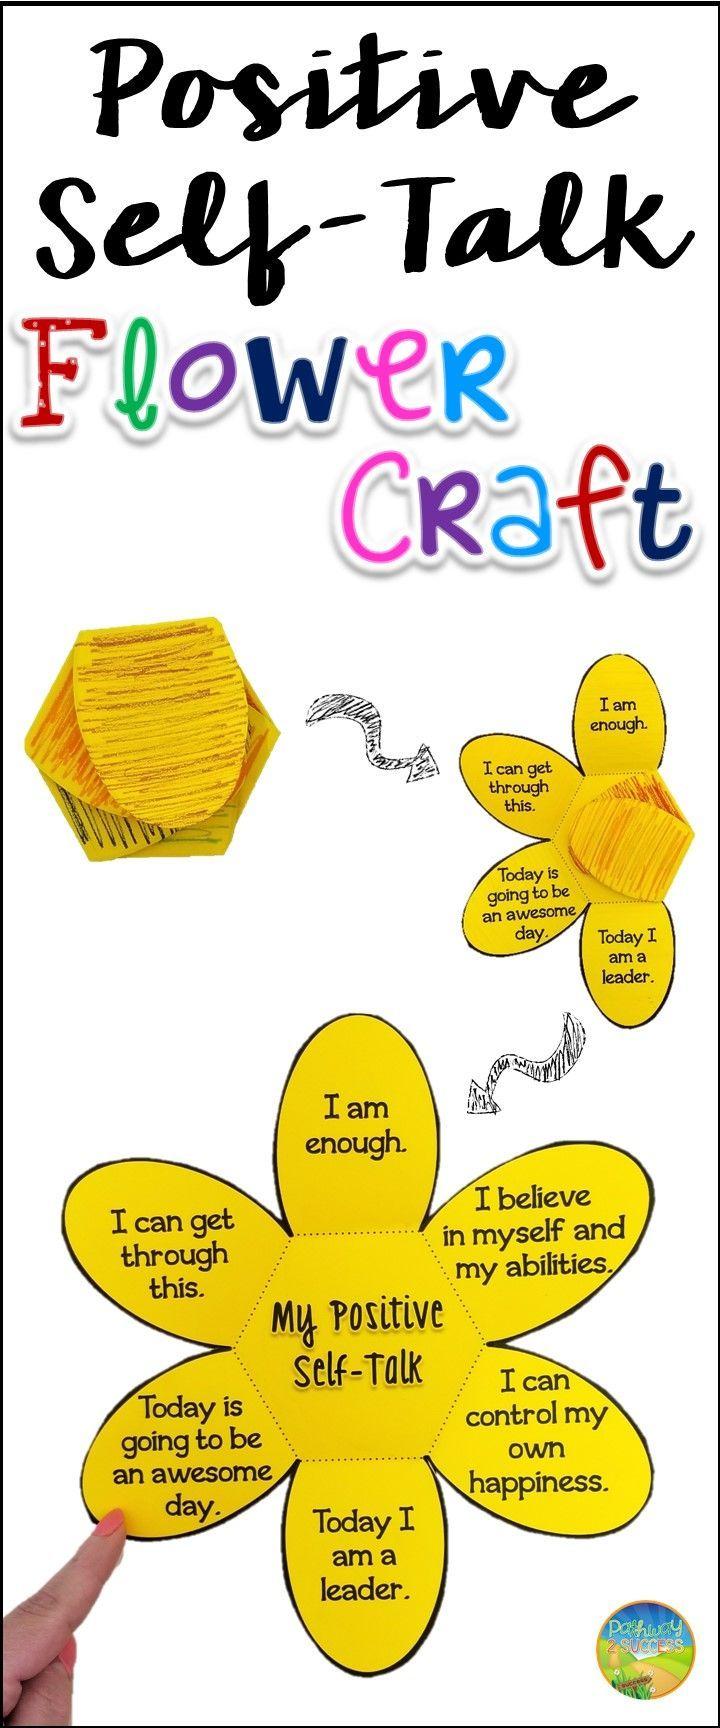 Positive Self Talk Flower Craft Social Work Positive